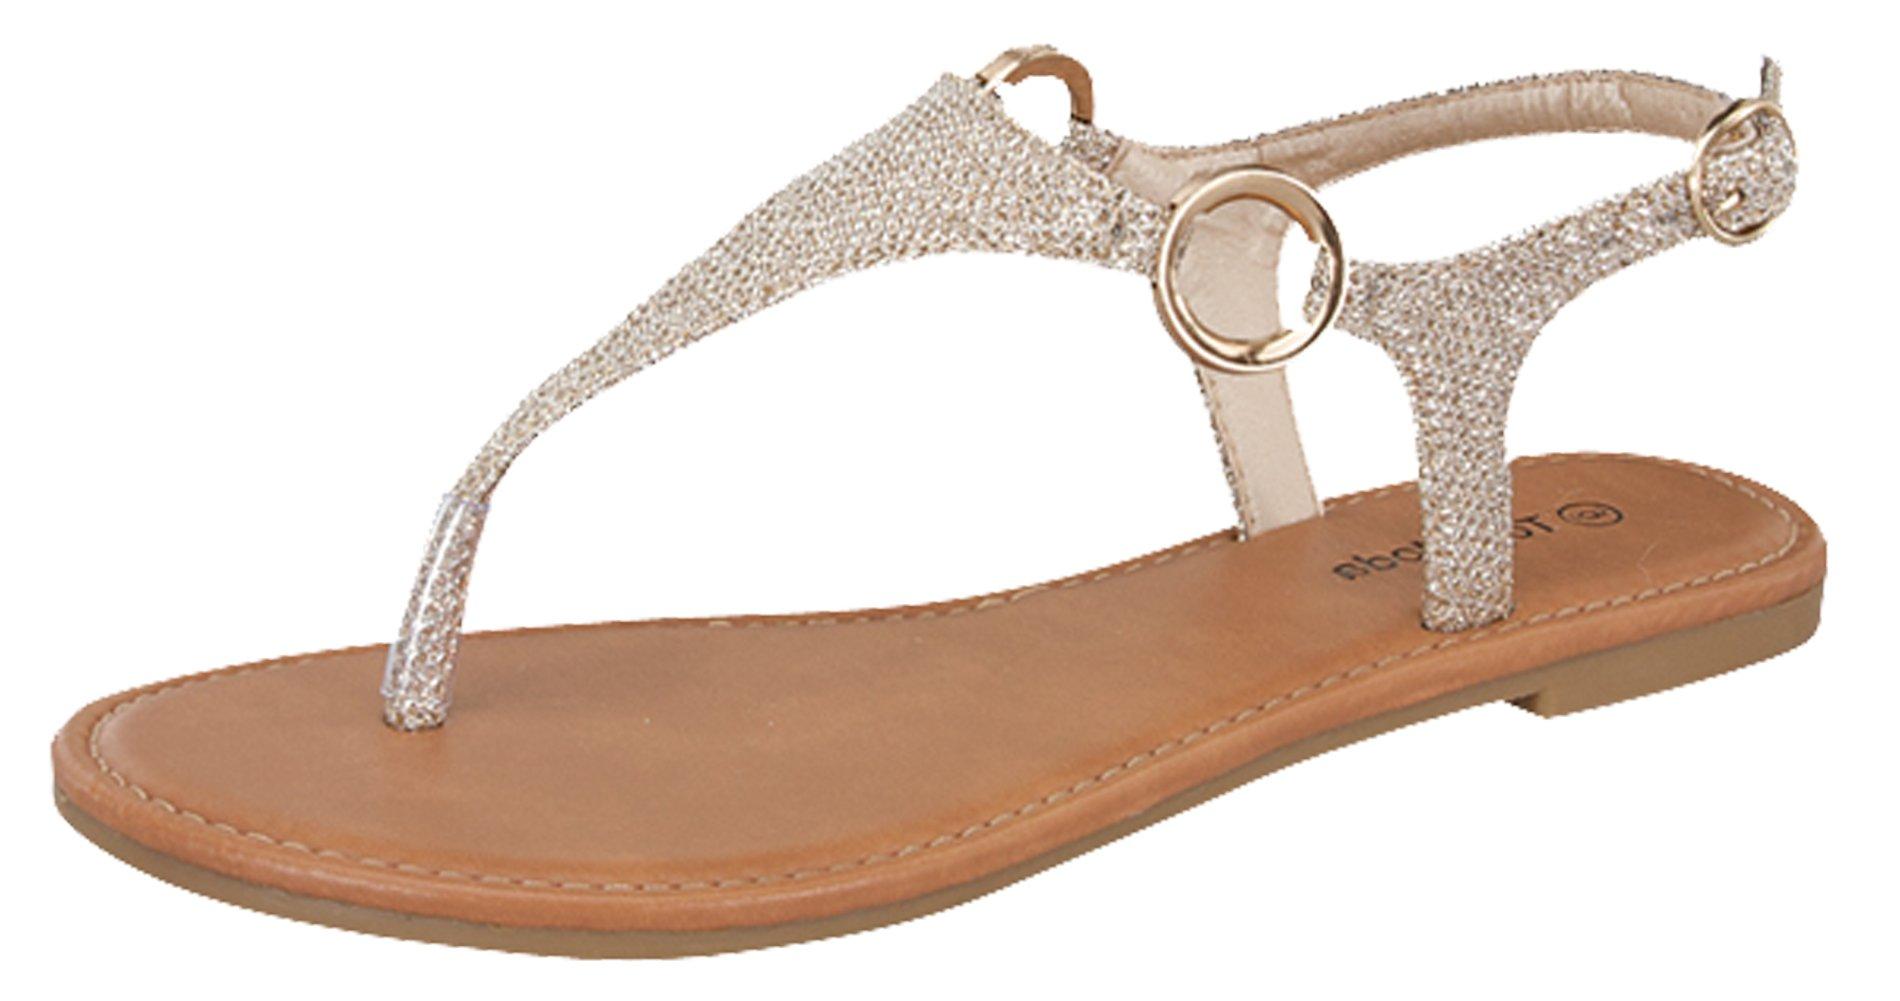 Top Moda Break-10 Womens T-Strap Buckle Flats Sandals, Champagne 6.5